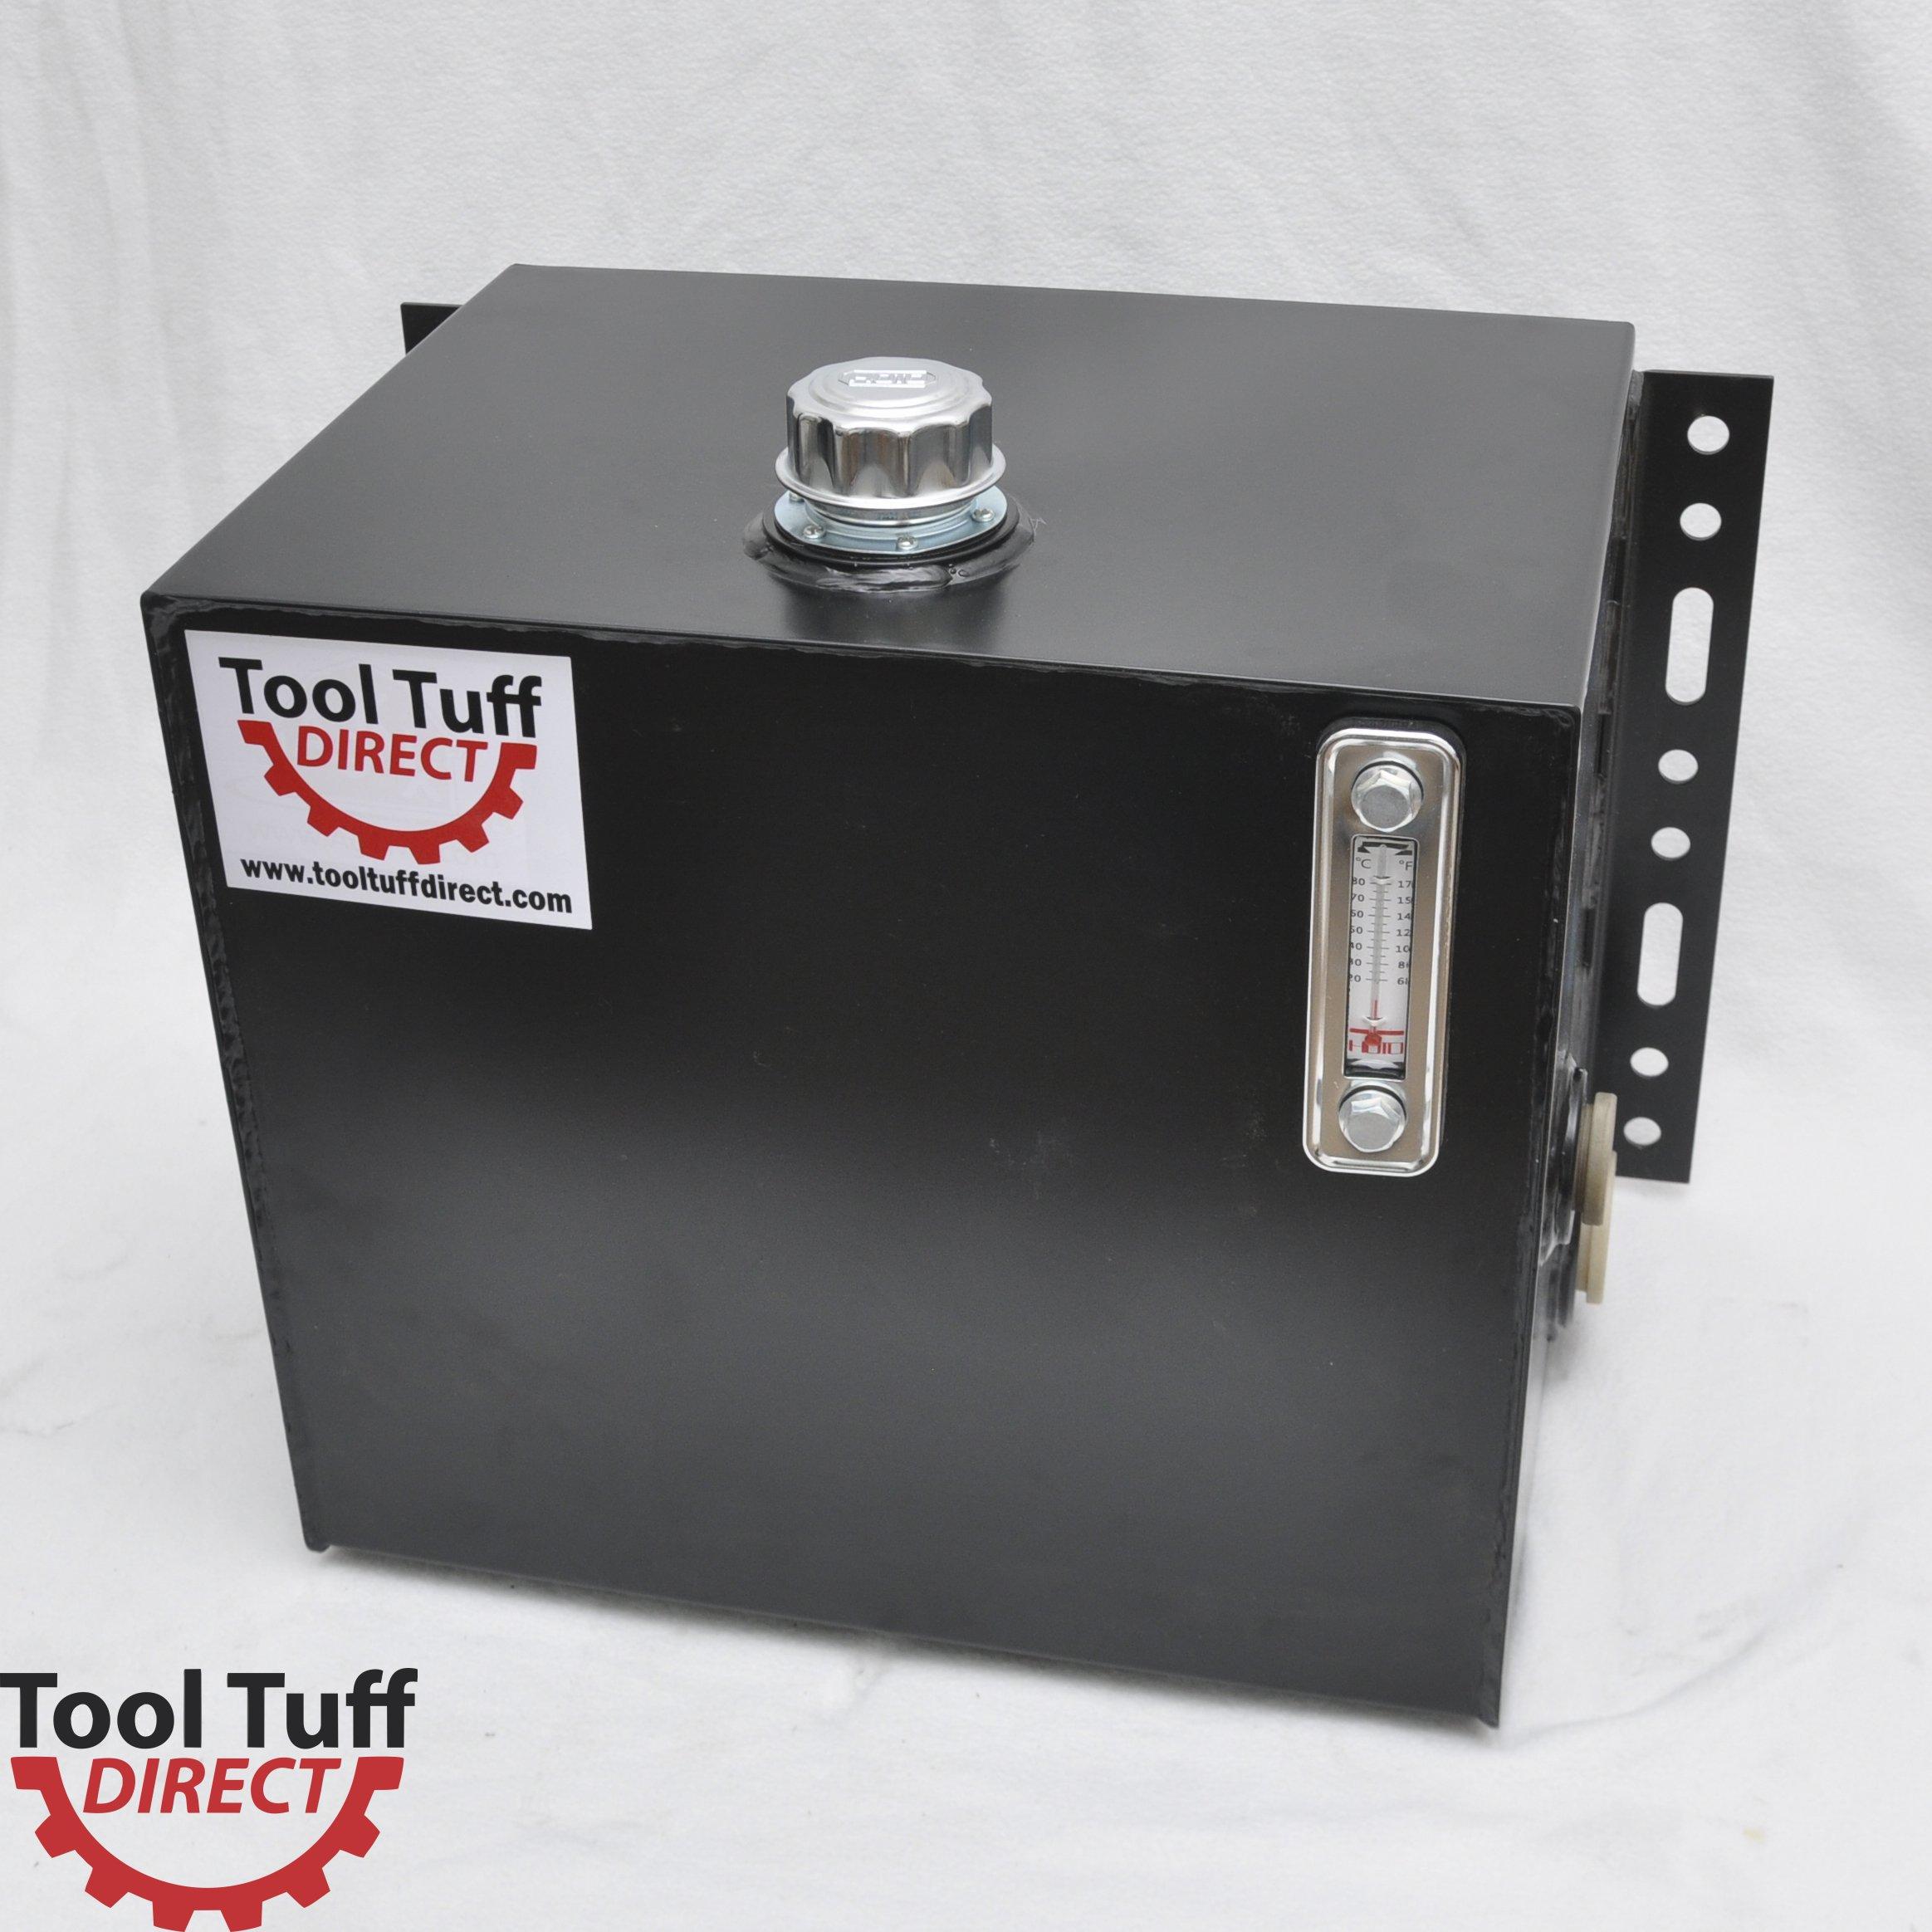 Tool-Tuff 25-Gallon Hydraulic Fluid Reservoir Tank, Side Vertical-Mount, w/Temp Gauge, Sight-Gauge & Breather/Strainer Fill Cap